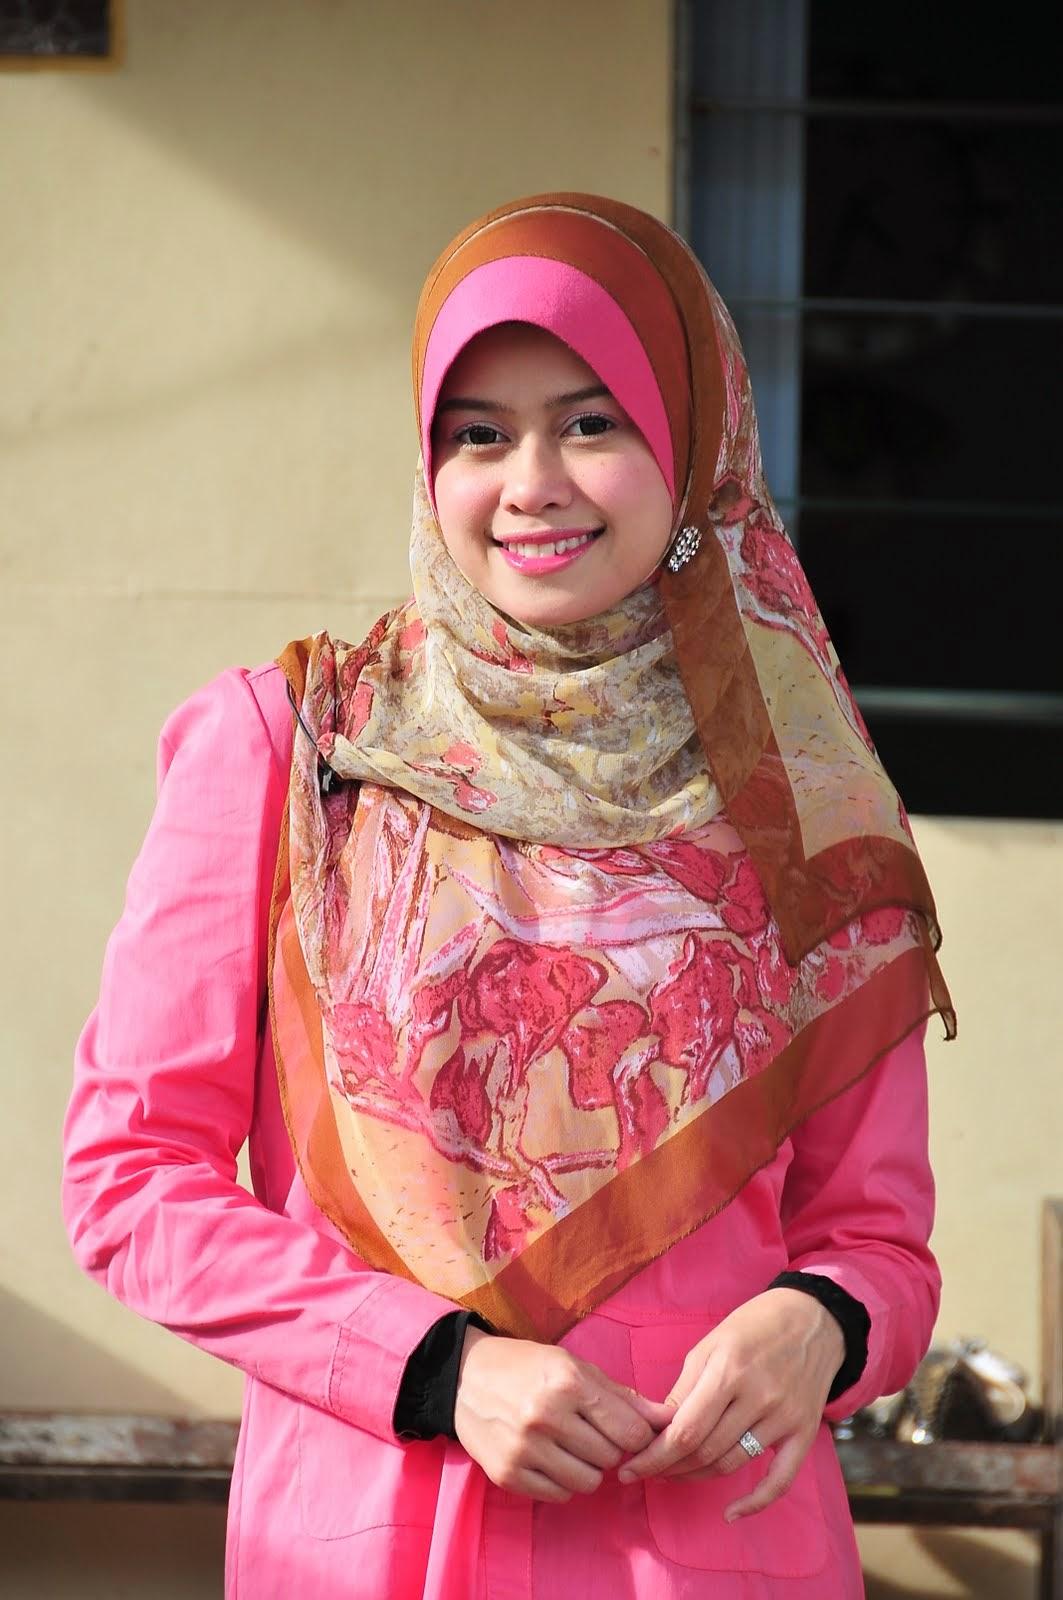 Foto 10 Artis Wanita Berjilbab Paling Cantik dan Manis di Malaysia | liataja.com